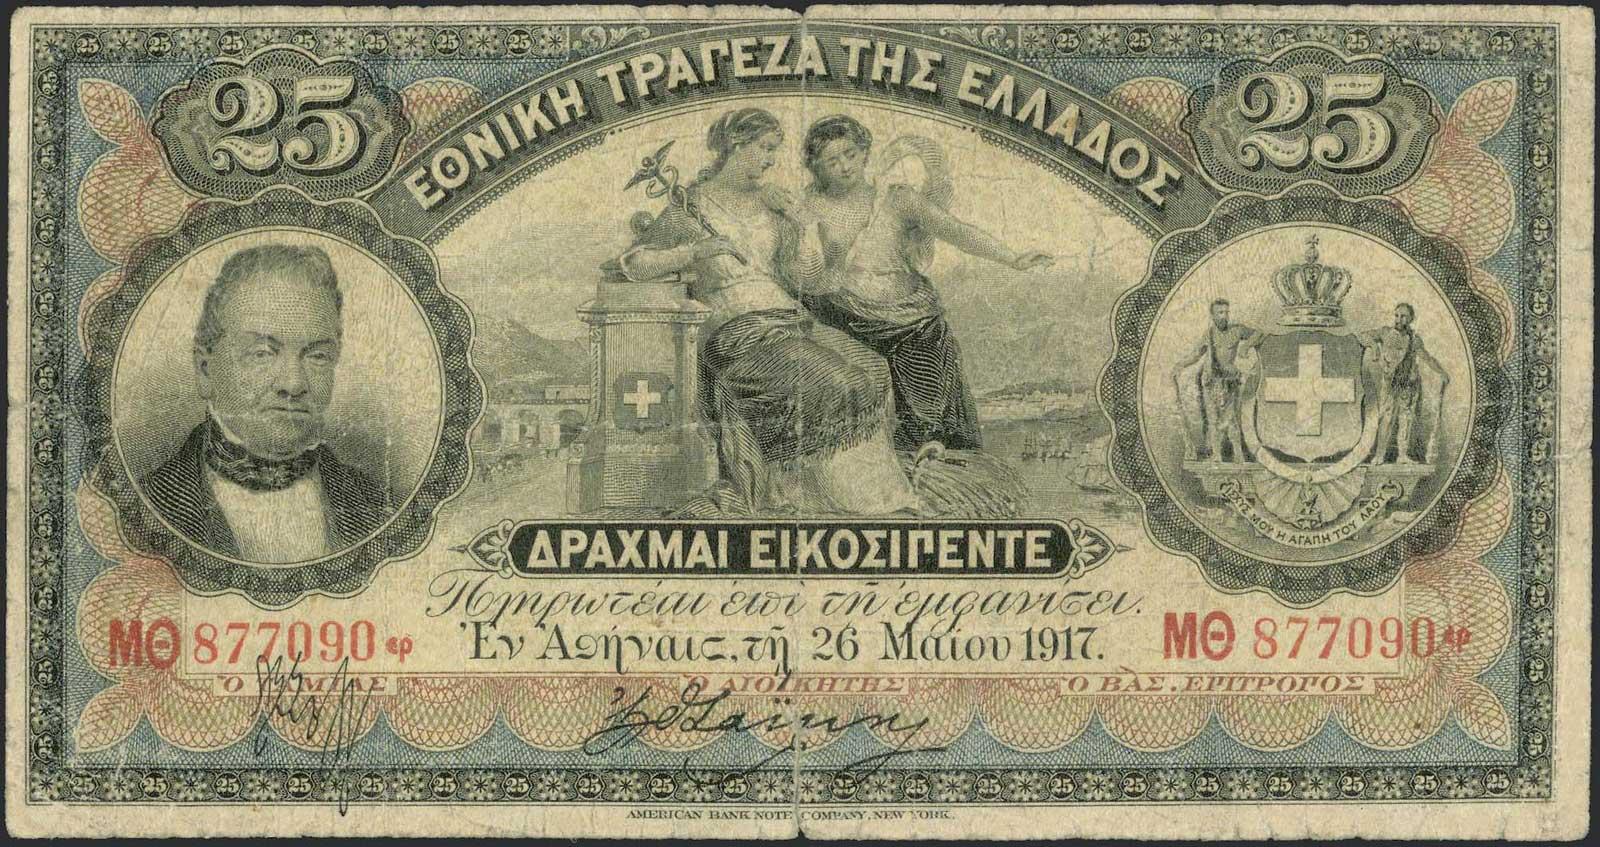 Lot 9261 - GREECE-  PAPER MONEY - BANKNOTES National Bank of Greece -  A. Karamitsos Public & LIVE Bid Auction 610 Coins, Medals & Banknotes